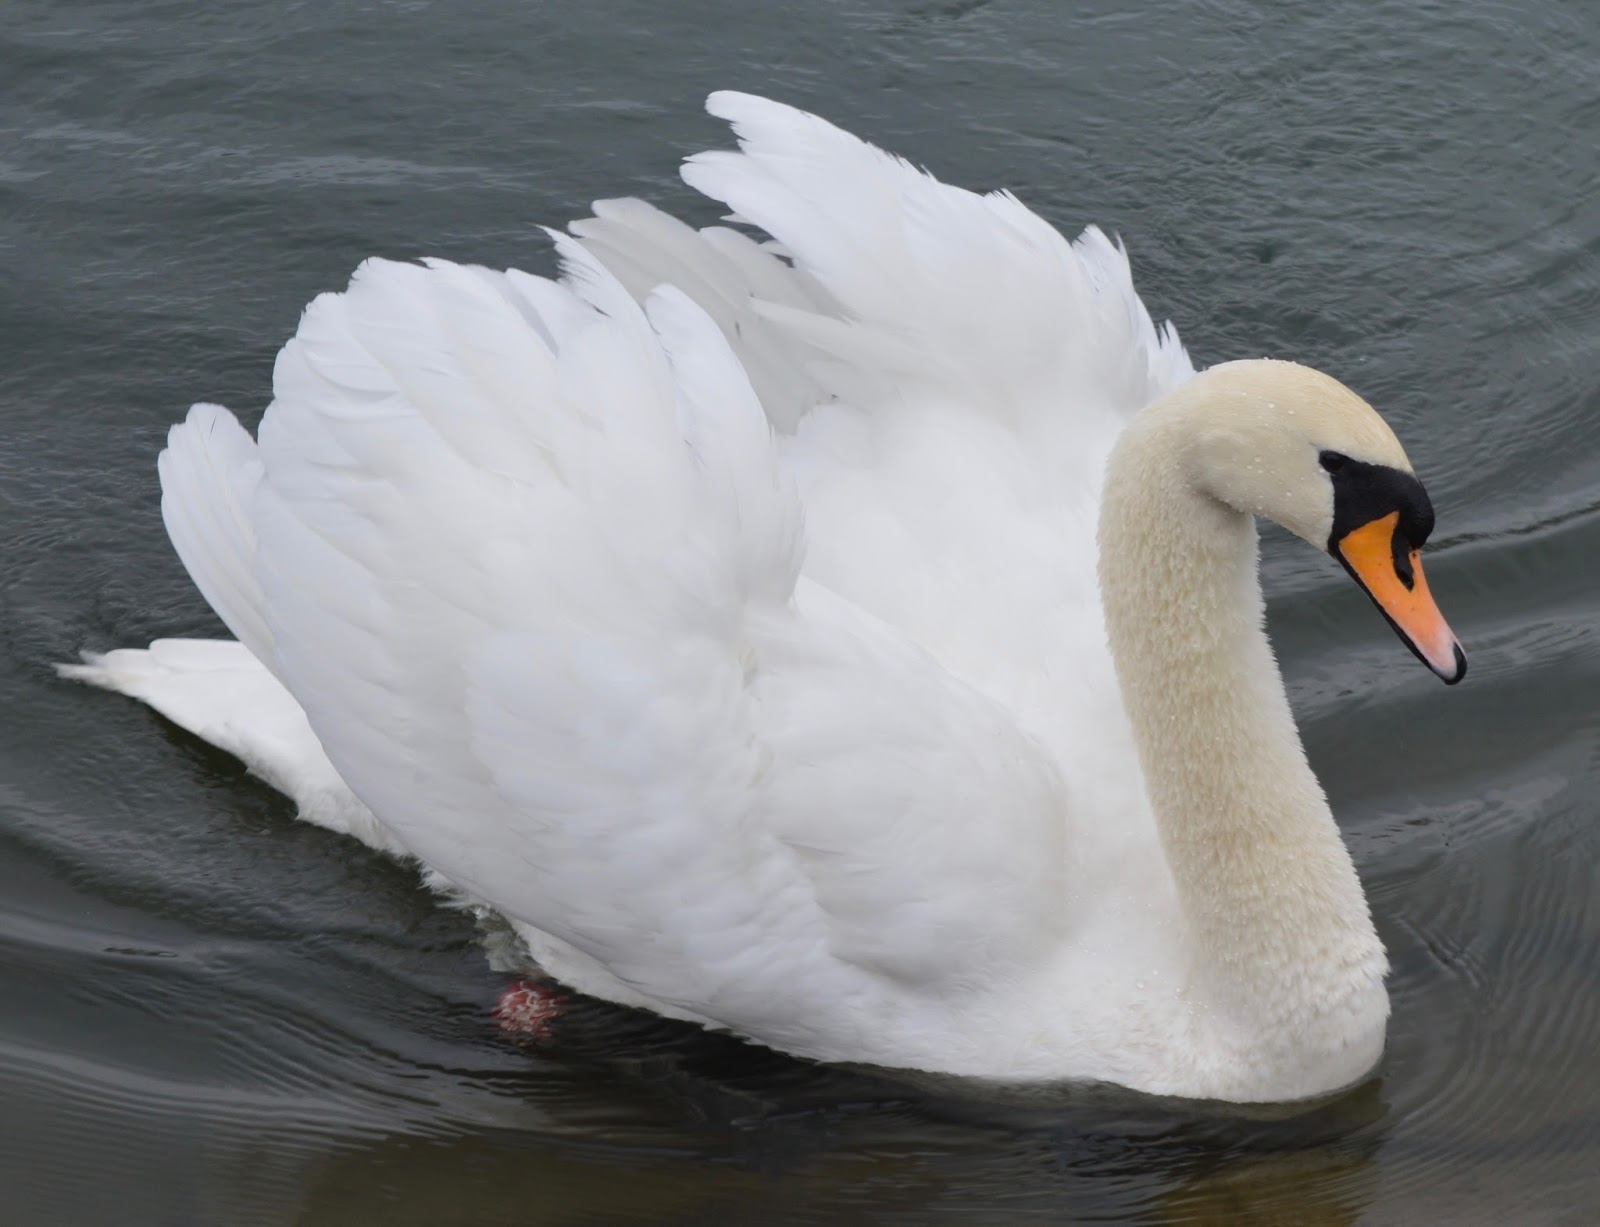 A swan at Saltwell Park